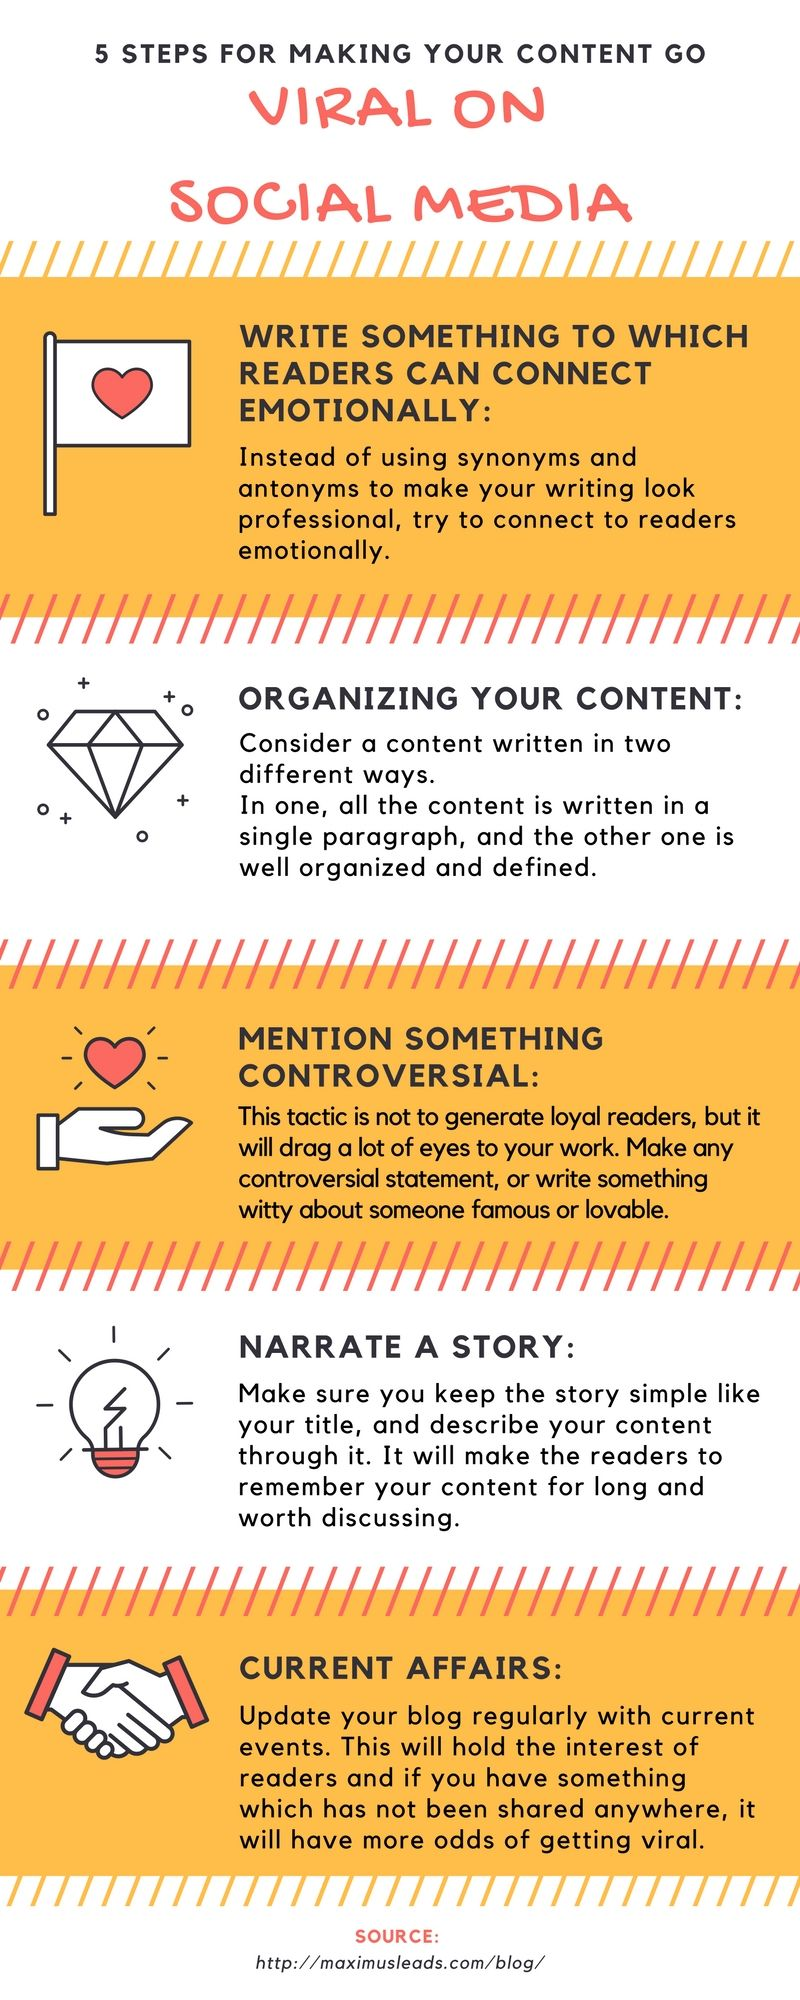 5 Steps For Making Your Content Go Viral On Social Media Social Marketing How To Make Social Media